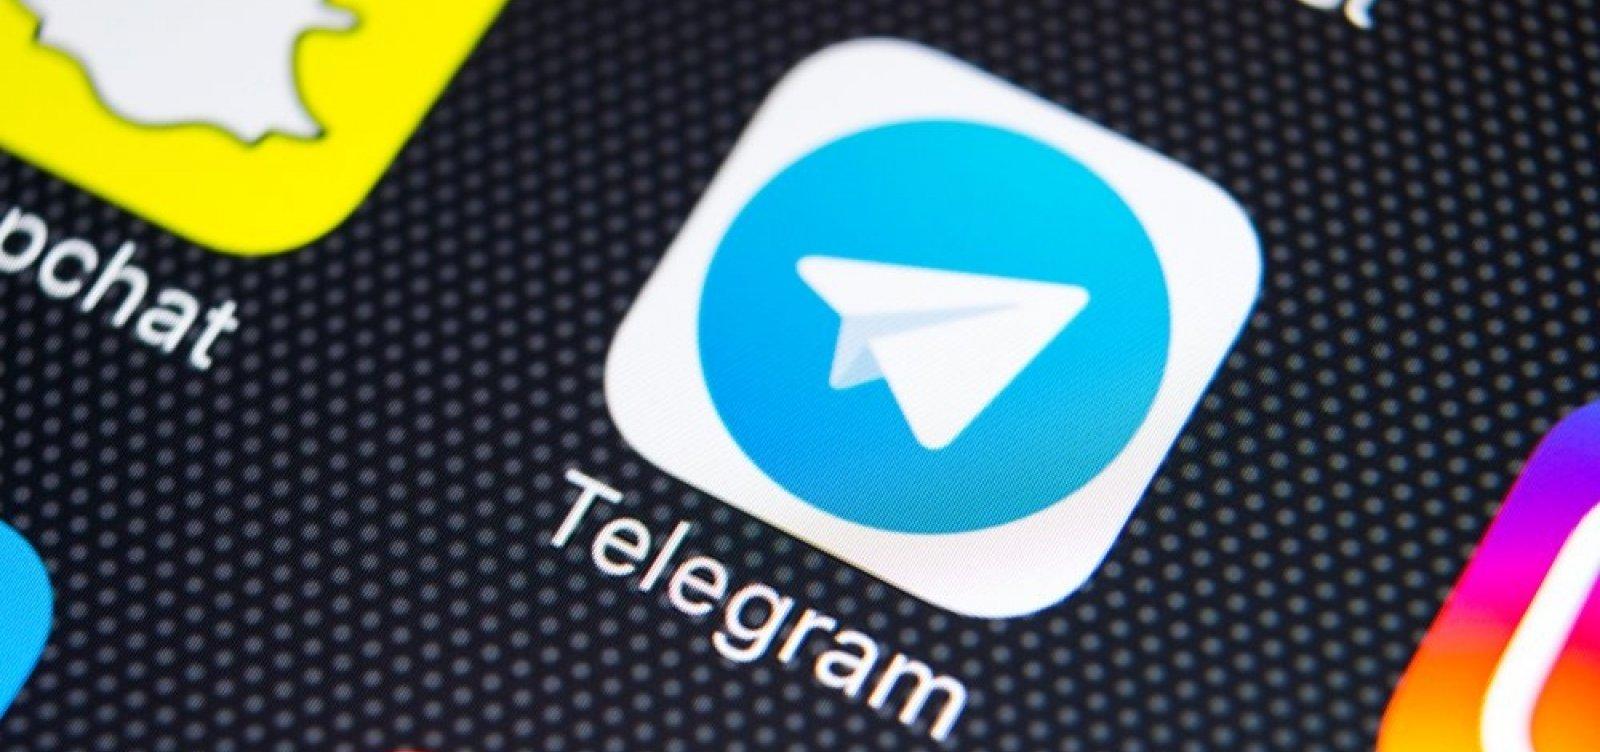 [Lava Jato: Telegram nega que tenha sido alvo de invasão hacker]